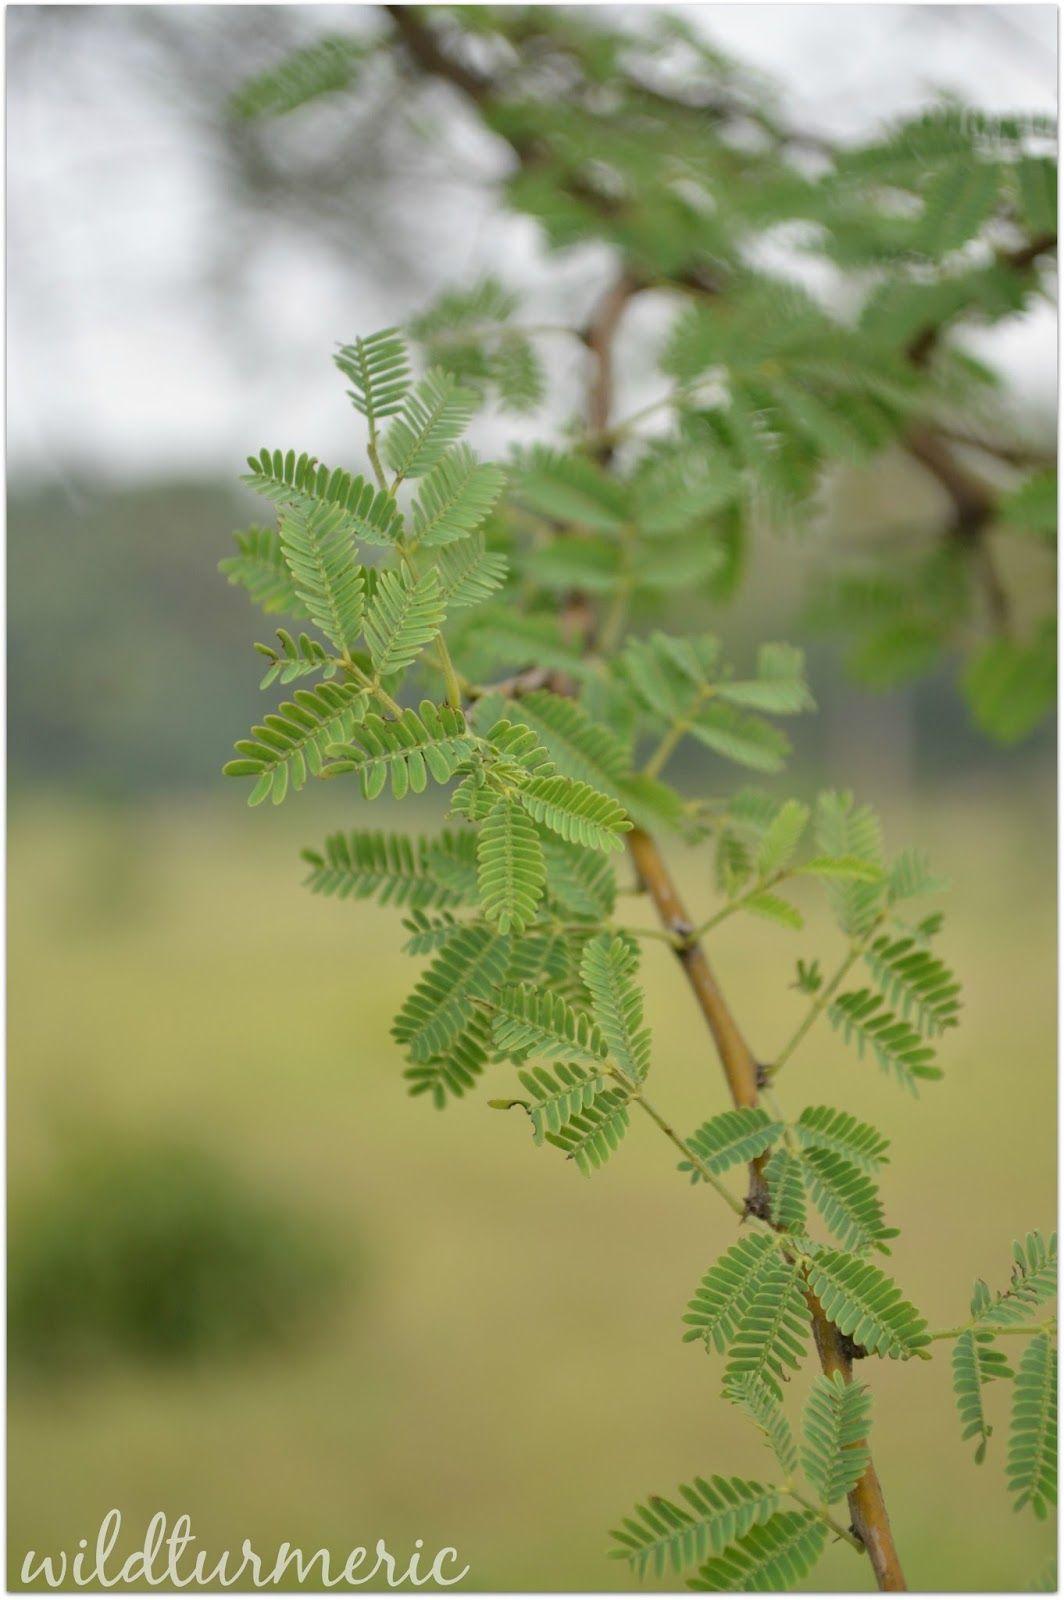 5 Top Medicinal Uses Of Babool Babul Tree Acacia Arabica Kikar Karuvela Maram Wildturmeric Herbal Plants Ayurvedic Plants Babul